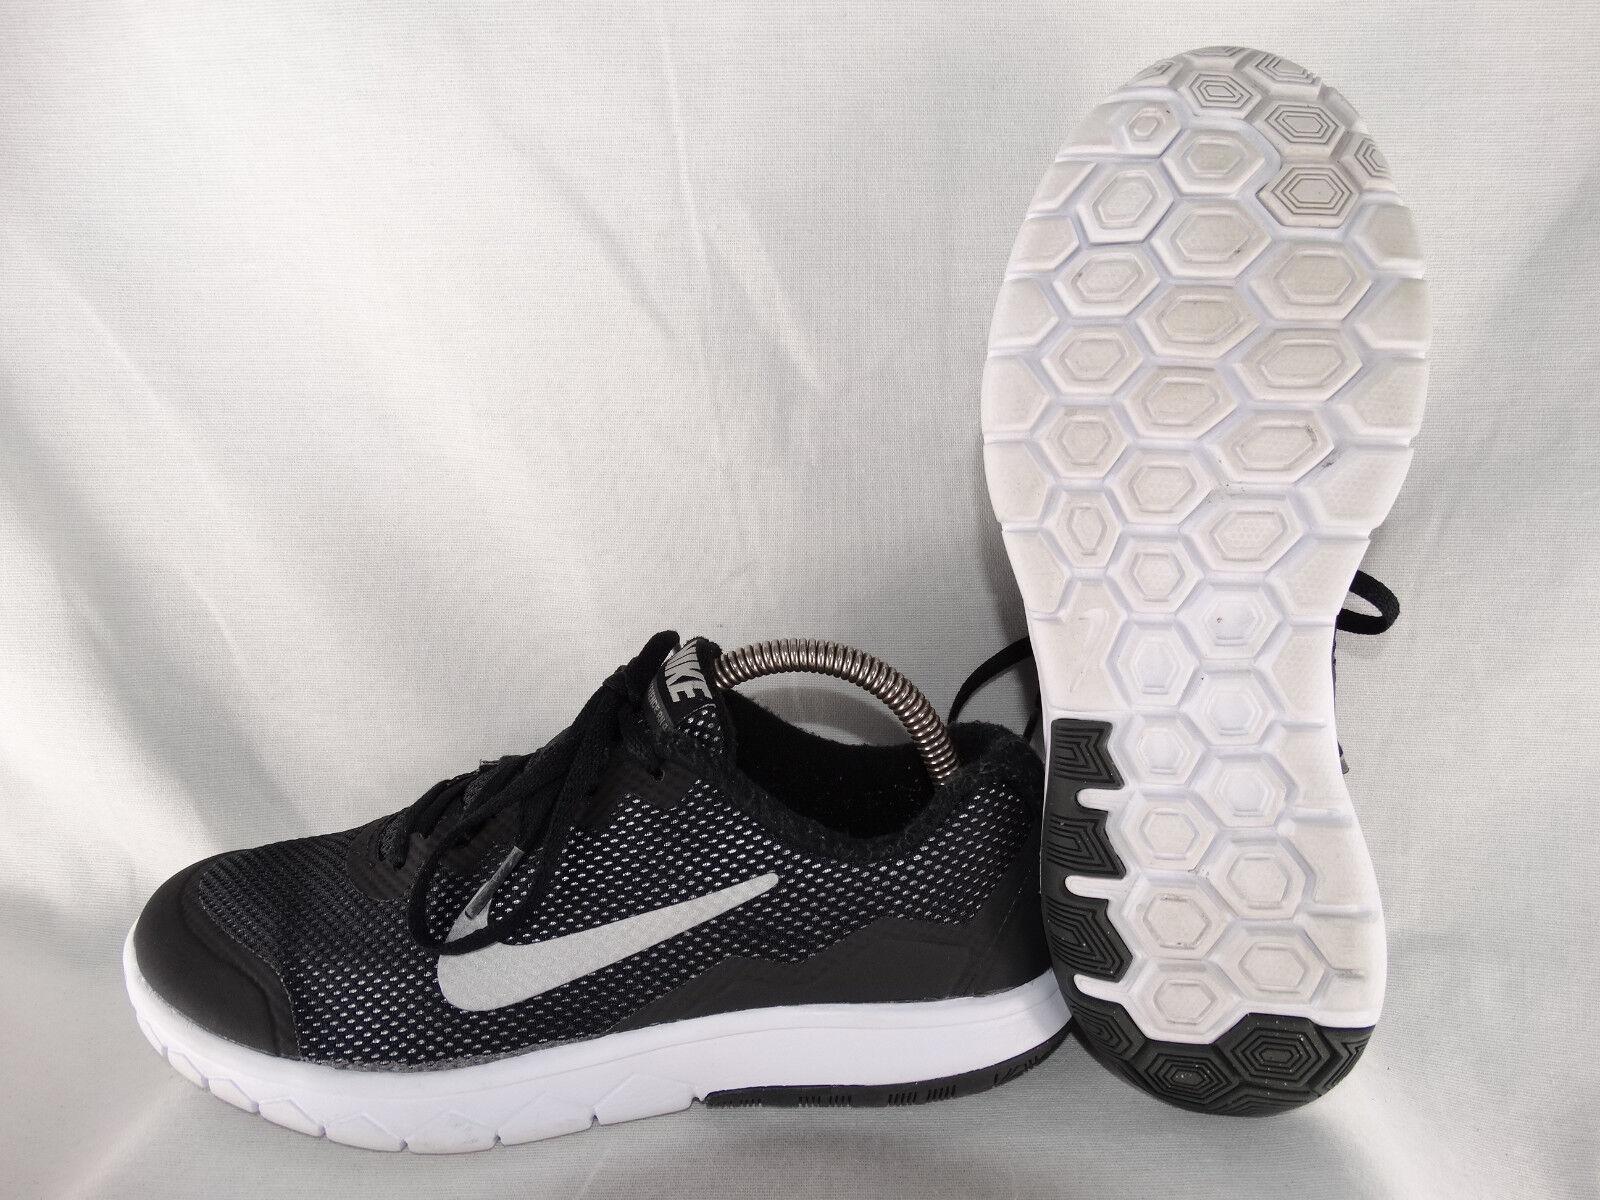 Nike Flex Experience 4 Damen Laufschuhe 749807-001 schwarz-silber EU 38,5 US 6Y